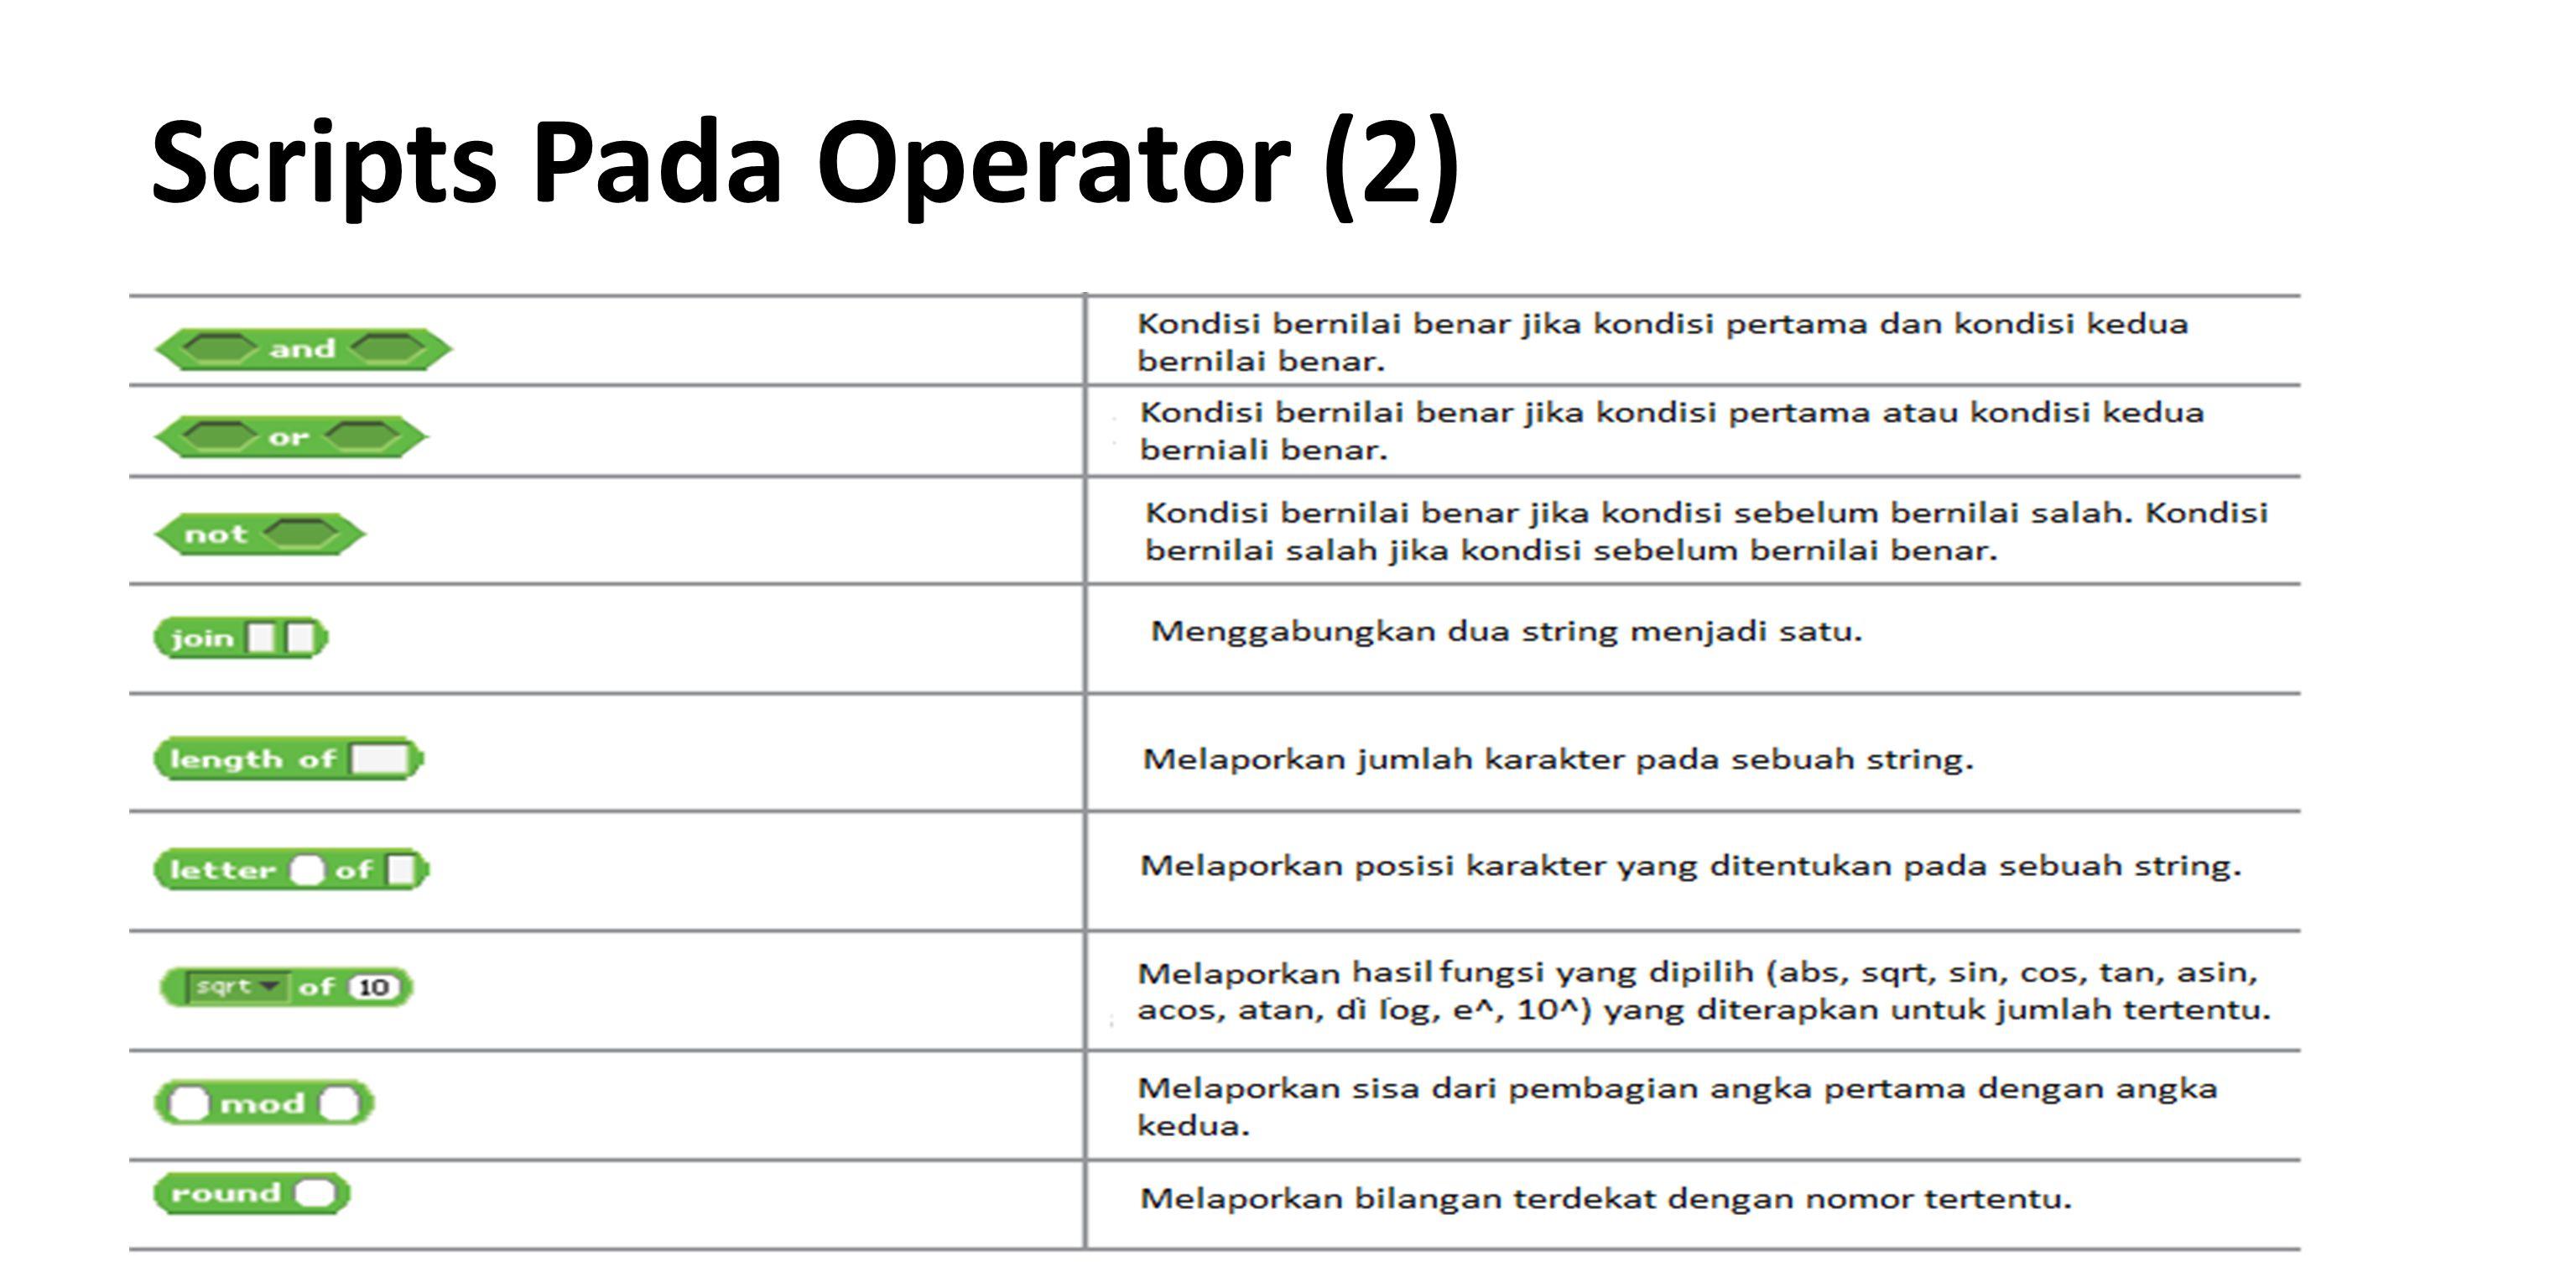 Arithmetic Operators Scratch mendukung empat operasi aritmatika dasar yaitu penambahan (+), pengurangan (-), perkalian (*), dan pembagian (/).